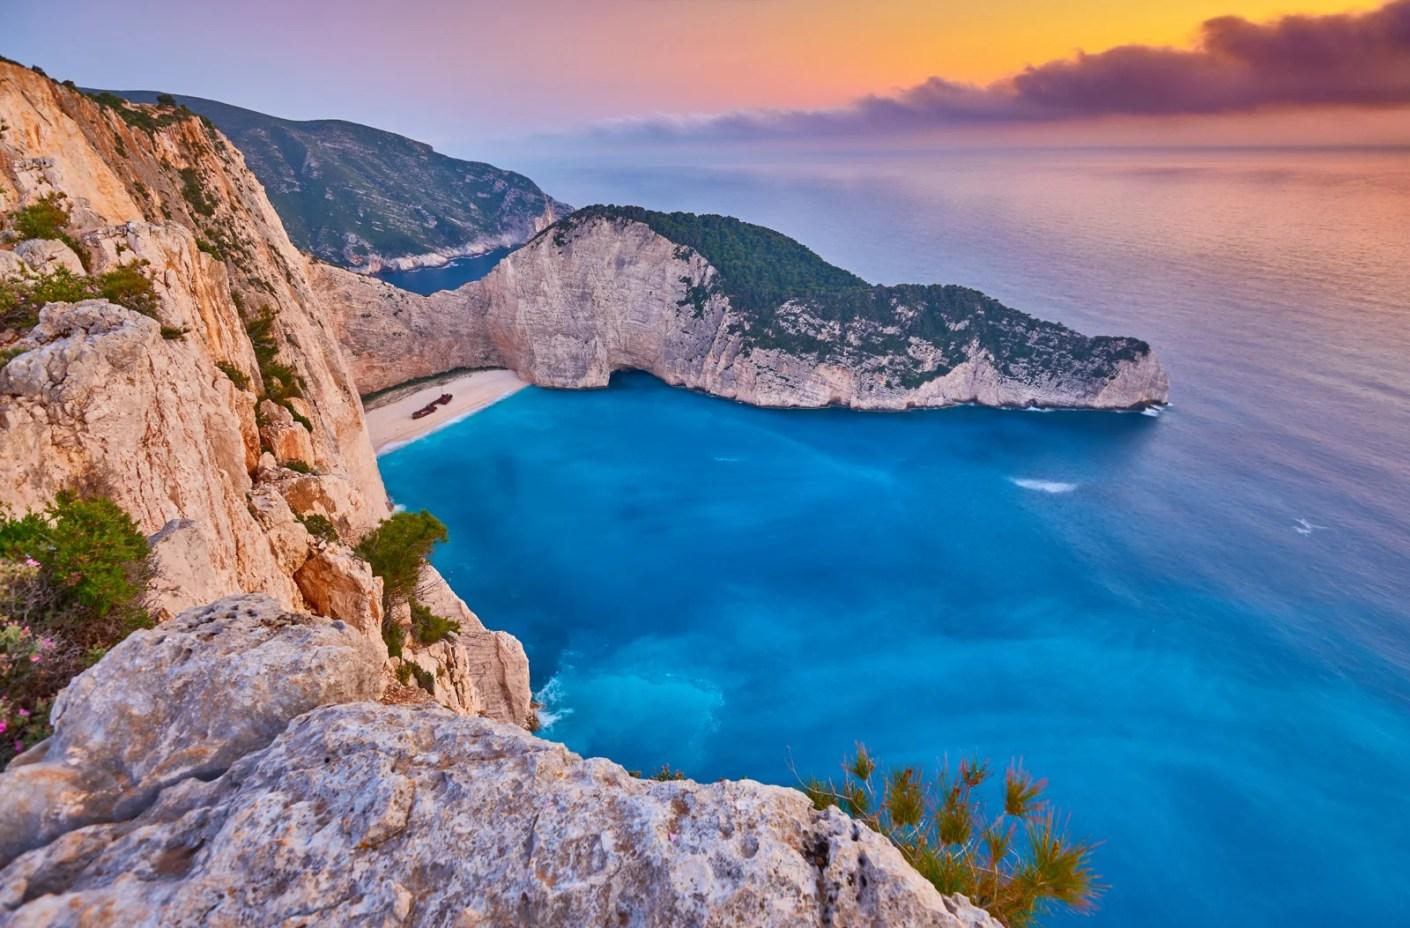 Navagio Beach on Zakynthos island, Greece. (Photo by Zick Svift / Shutterstock)